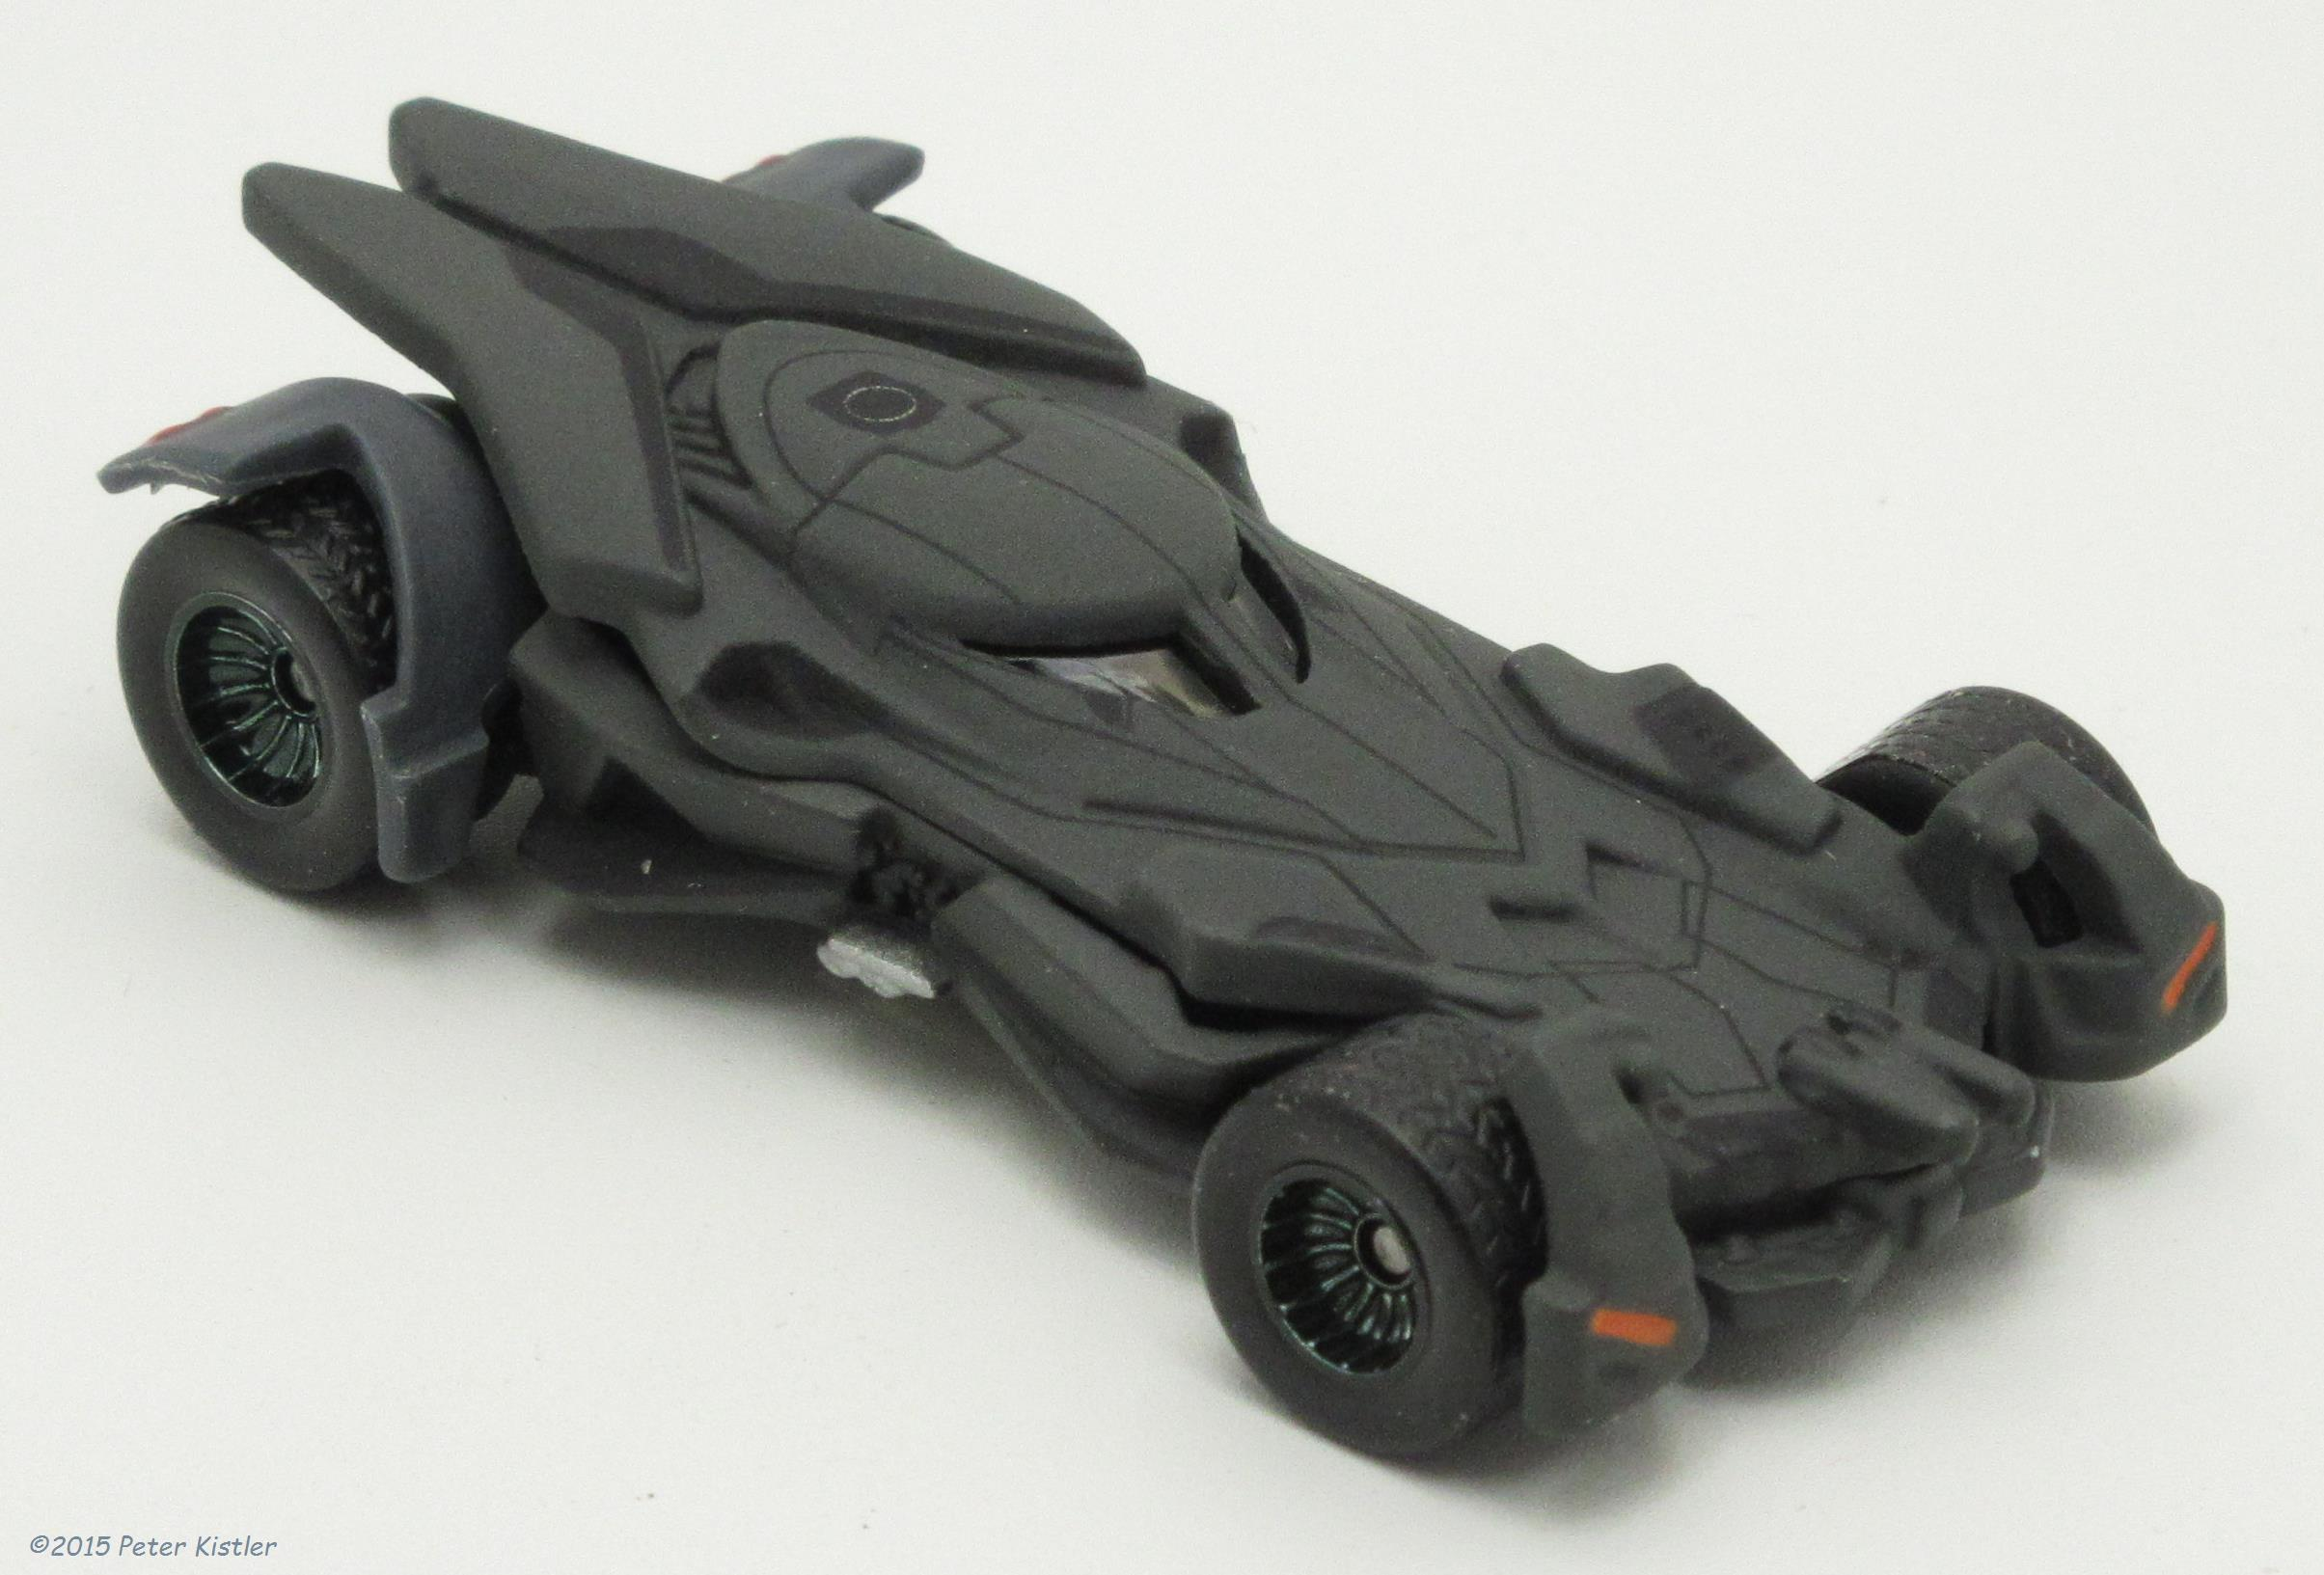 Batmobile BATMAN SUPERMAN V in 1:64 HOT WHEELS djf57 RETRO ENTERTAINMENT